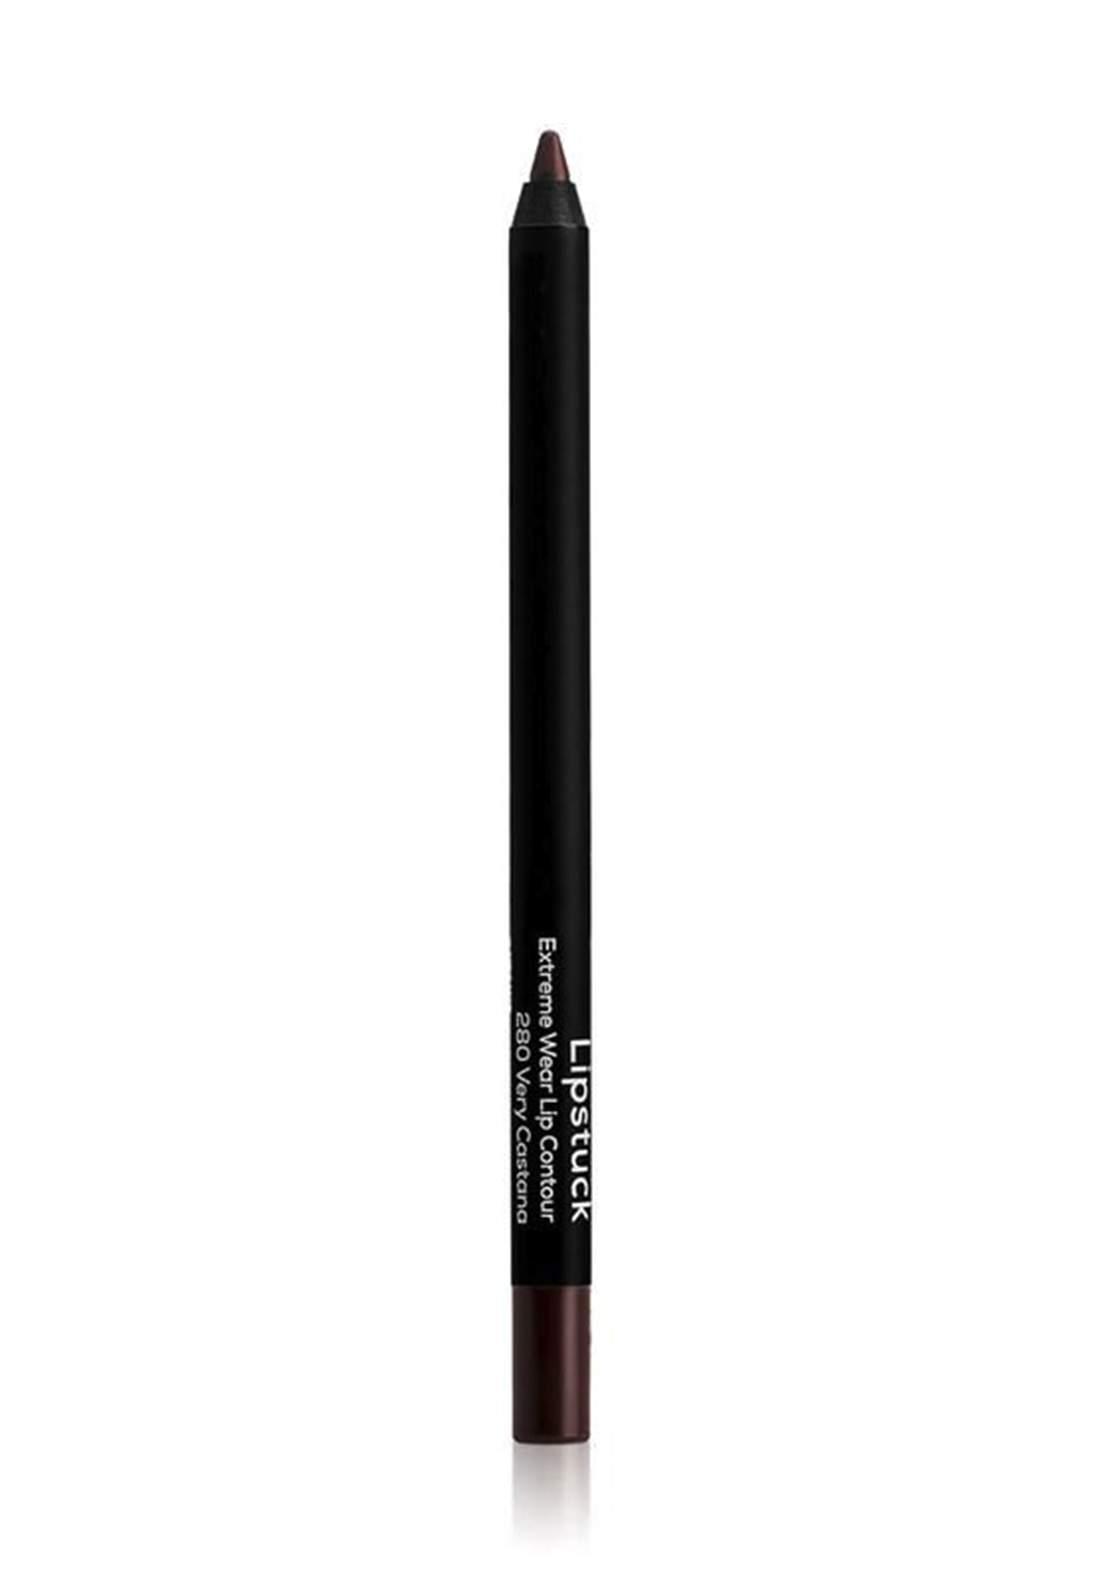 Wow By Wojooh 2522W280 Lipstuck Extreme Wear Lip Contour No.280 Very Castana 1.20g محدد الشفاه